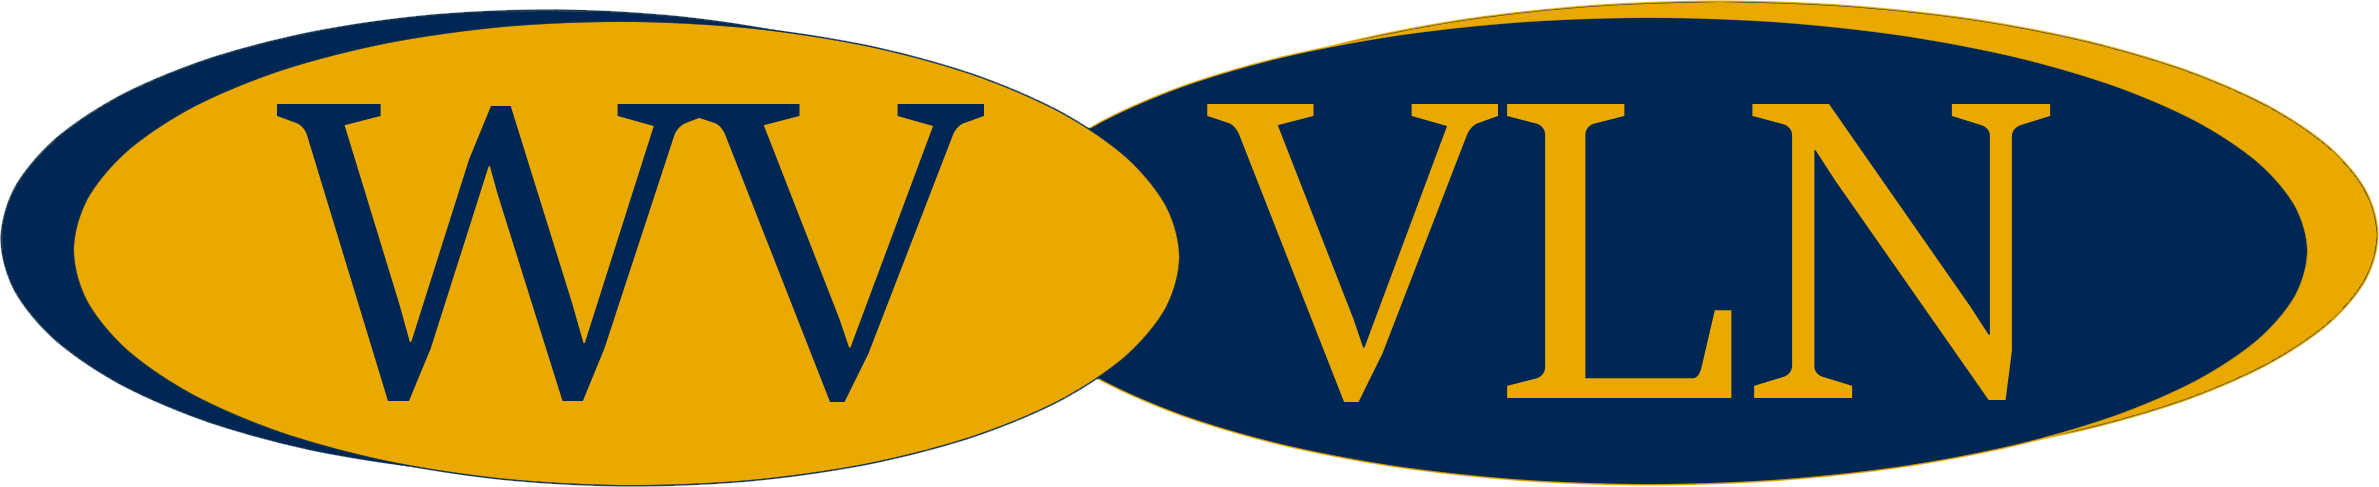 wvvln-logo-